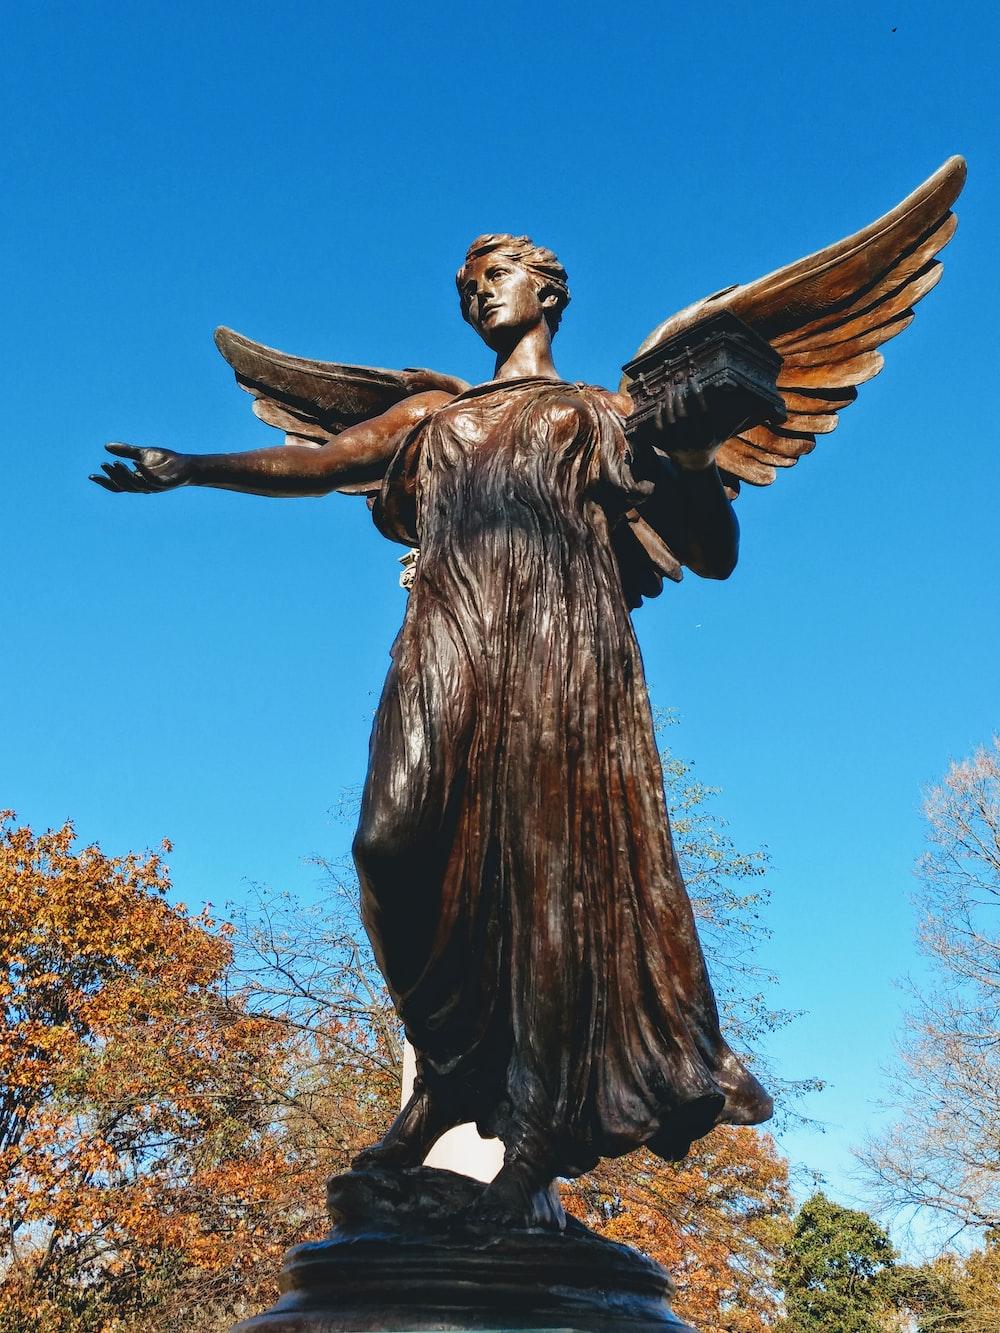 female angel statue under a calm blue sky